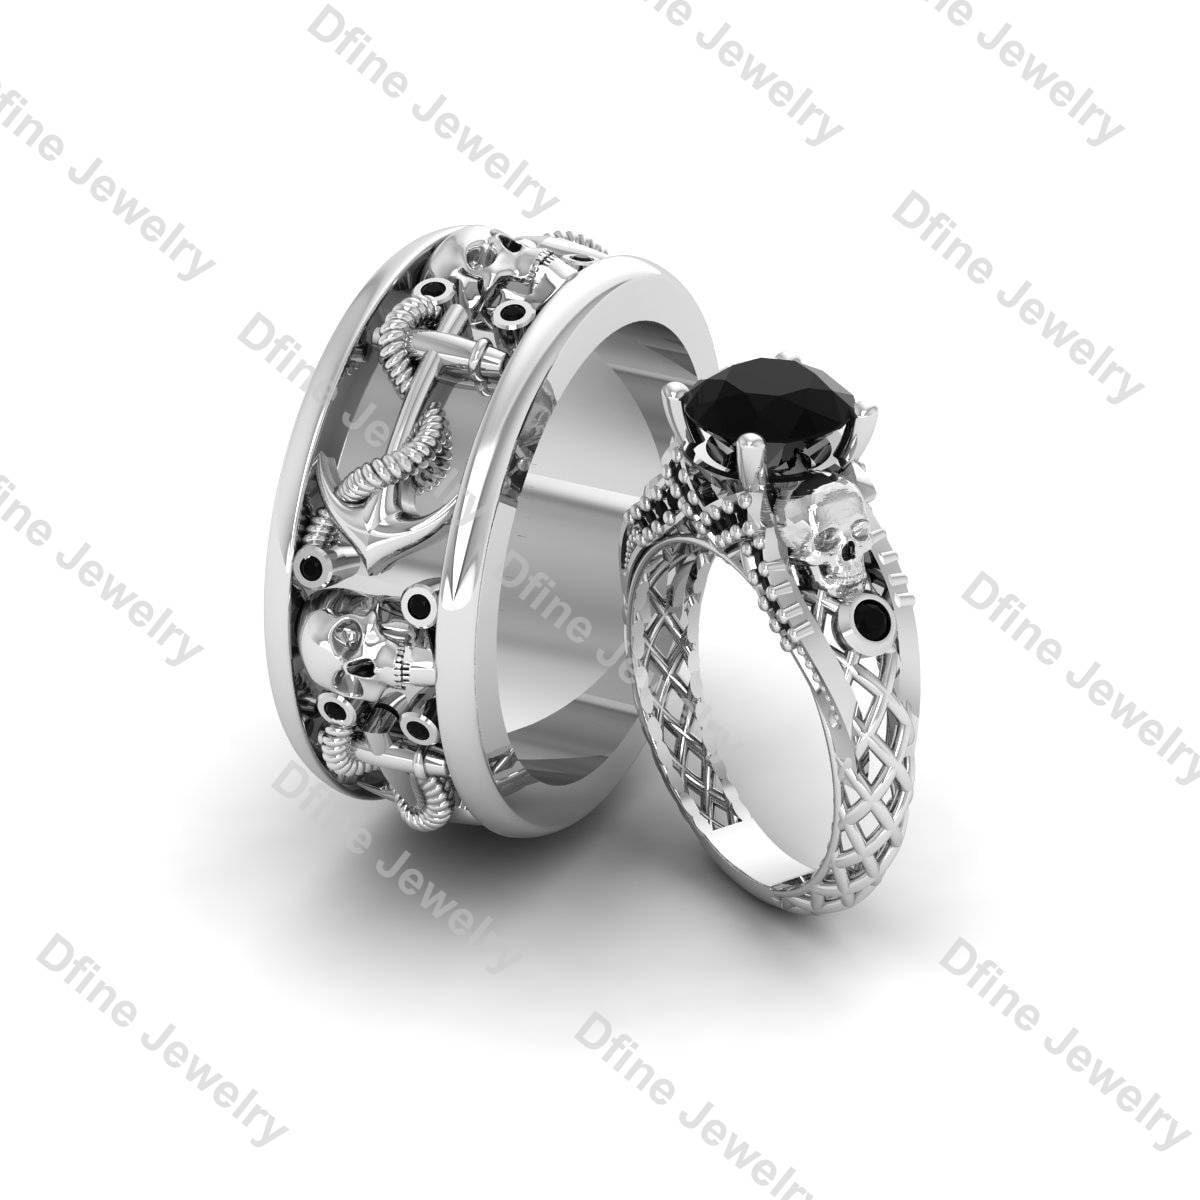 Captain Of Ship Anchor Skull Band Witchy Dark Fantasy Gothic Engagement Ring  2pc Couple Set Black